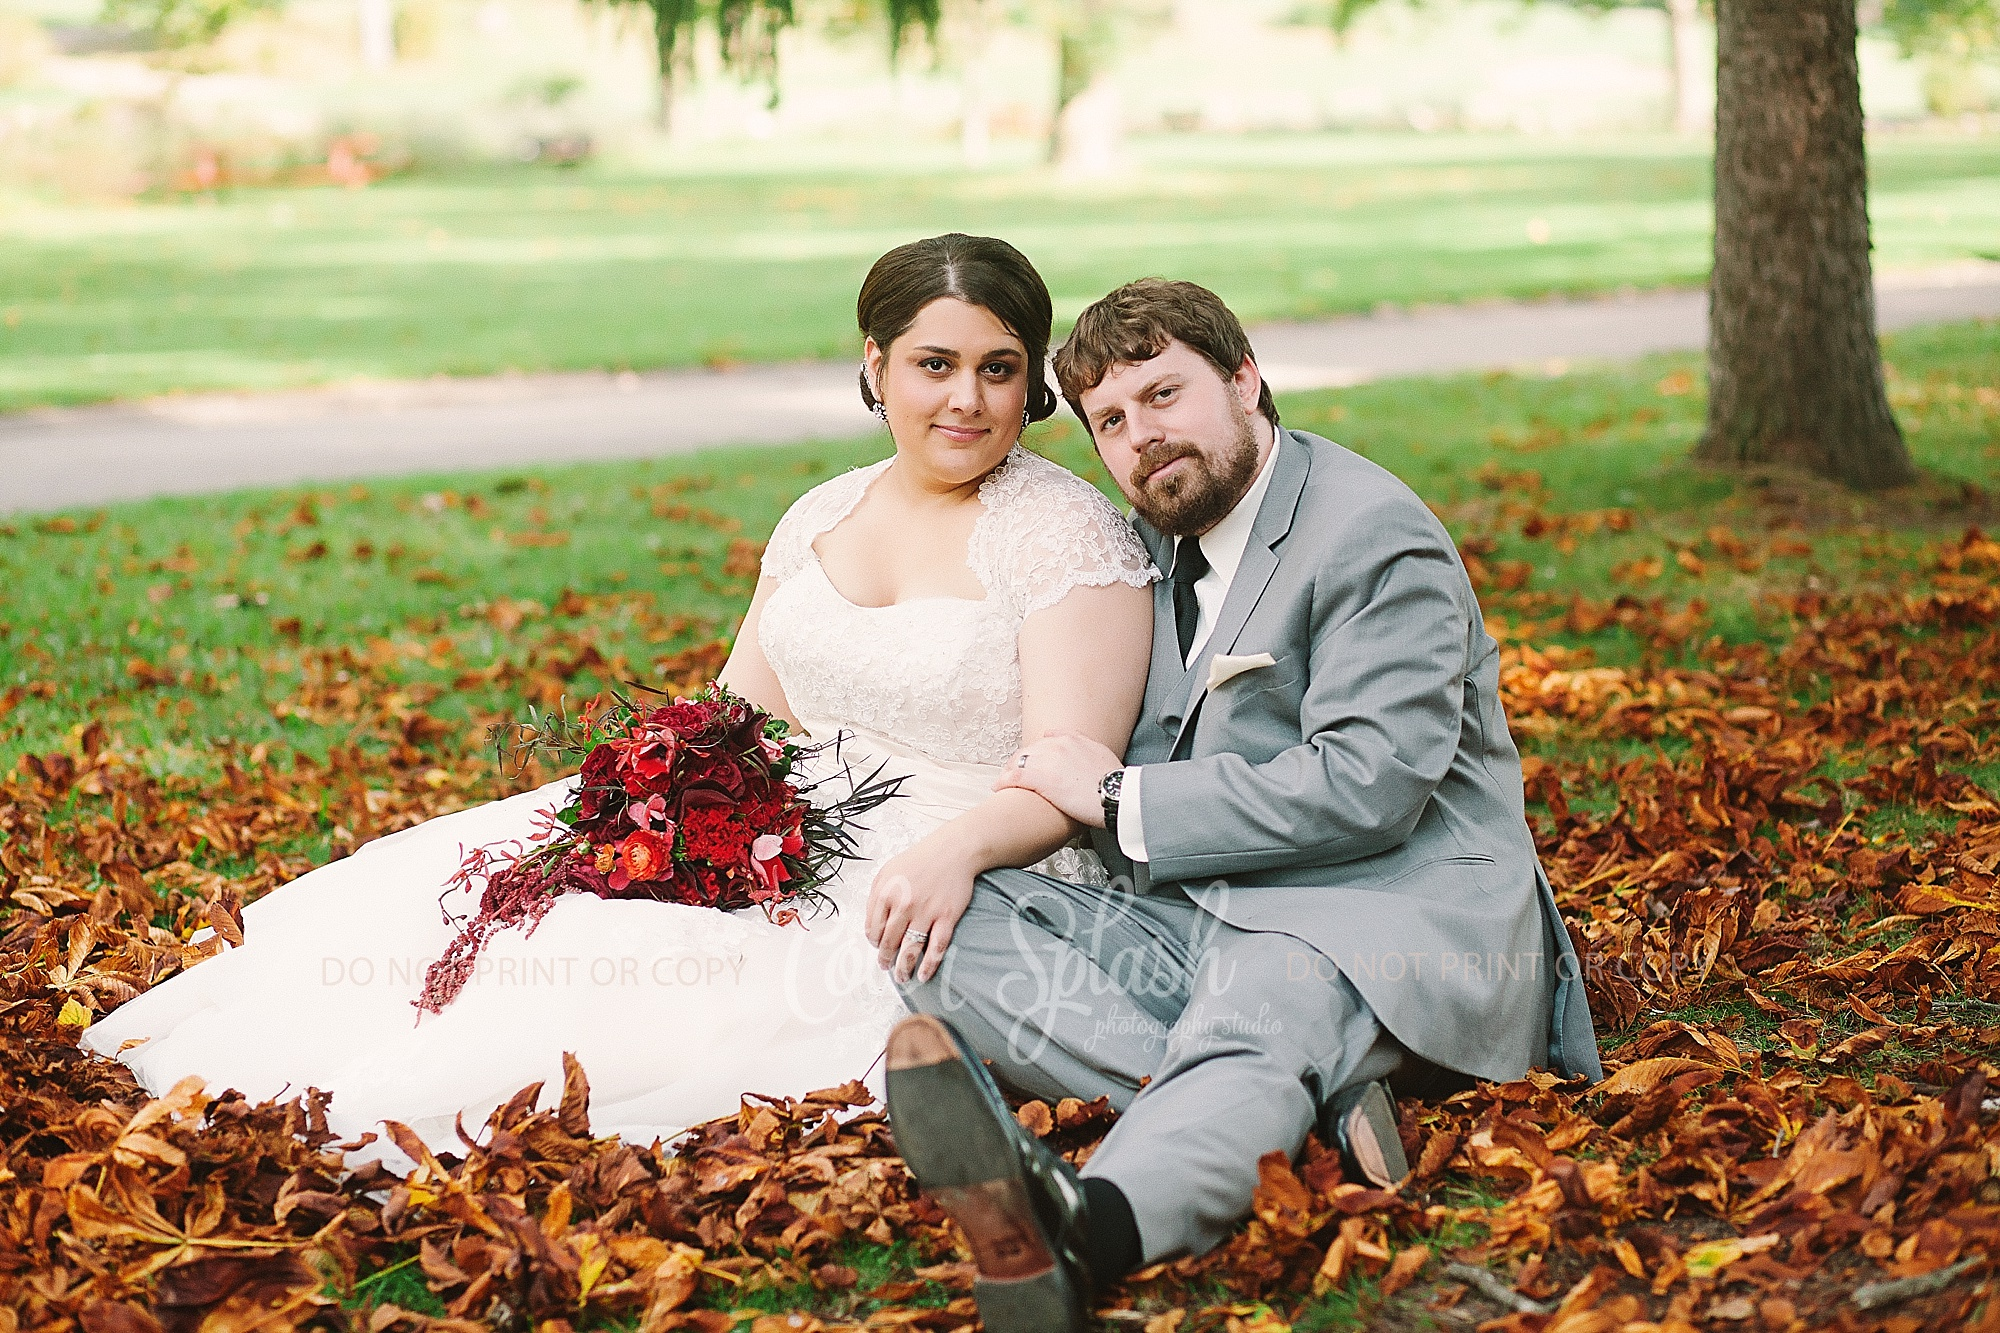 stetston-chapel-cityscapes-wedding-kalamazoo_0308